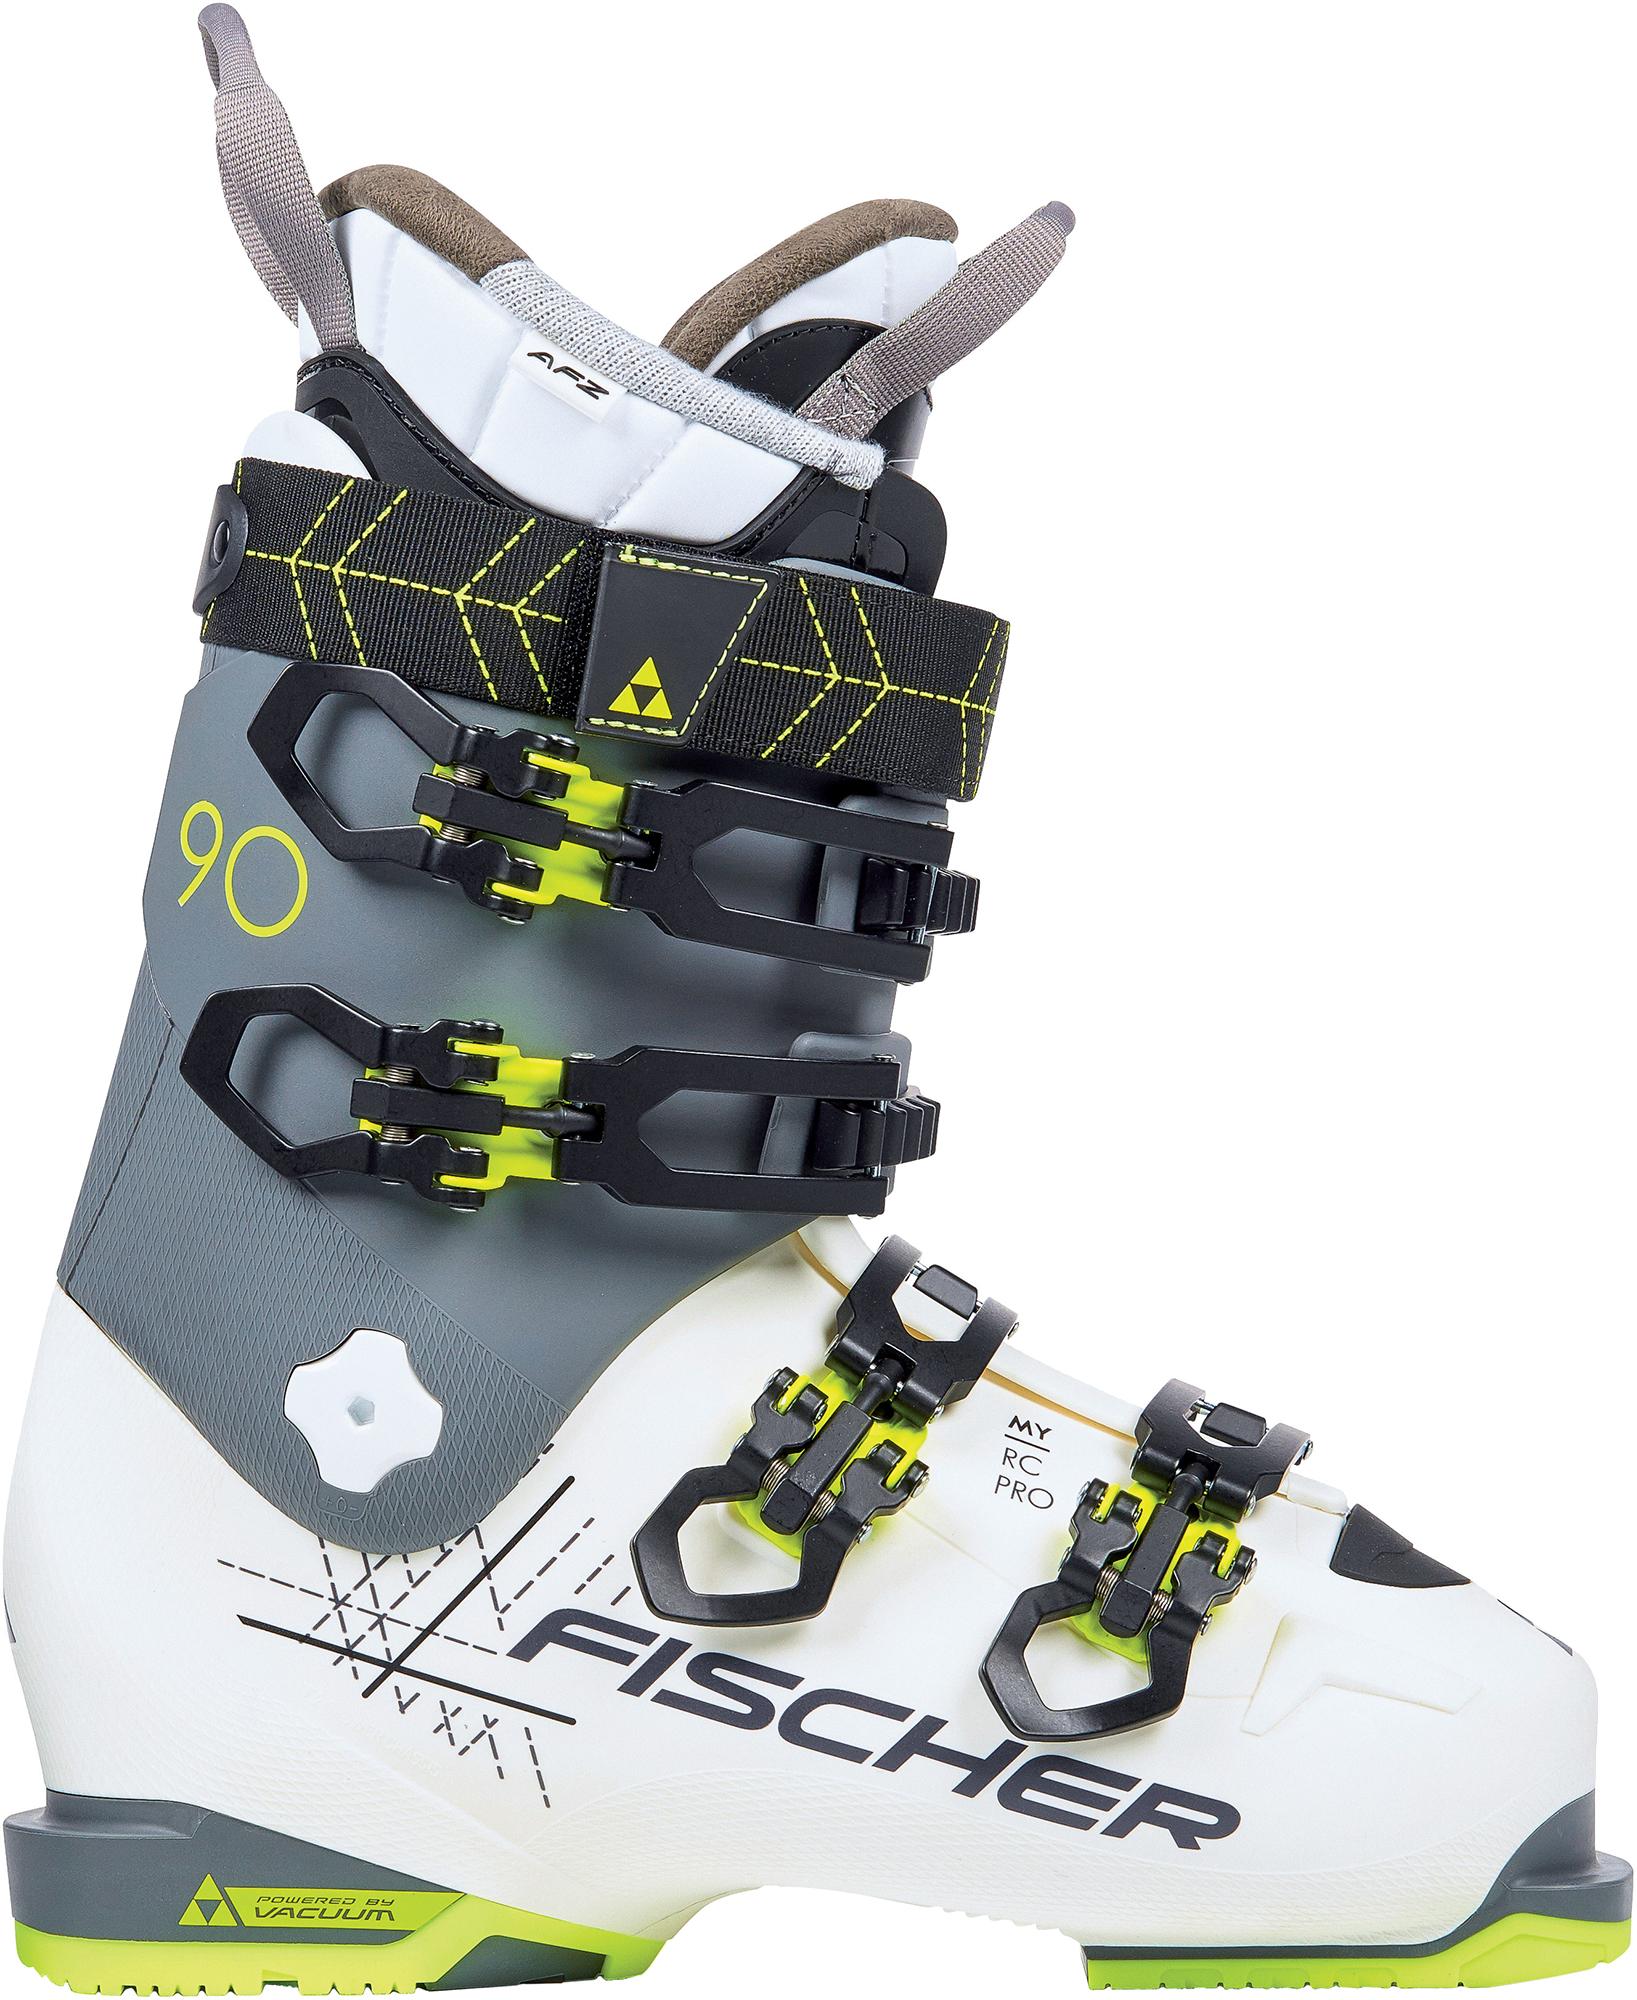 Fischer Ботинки горнолыжные женские My Rc Pro 90 Pbv, размер 41